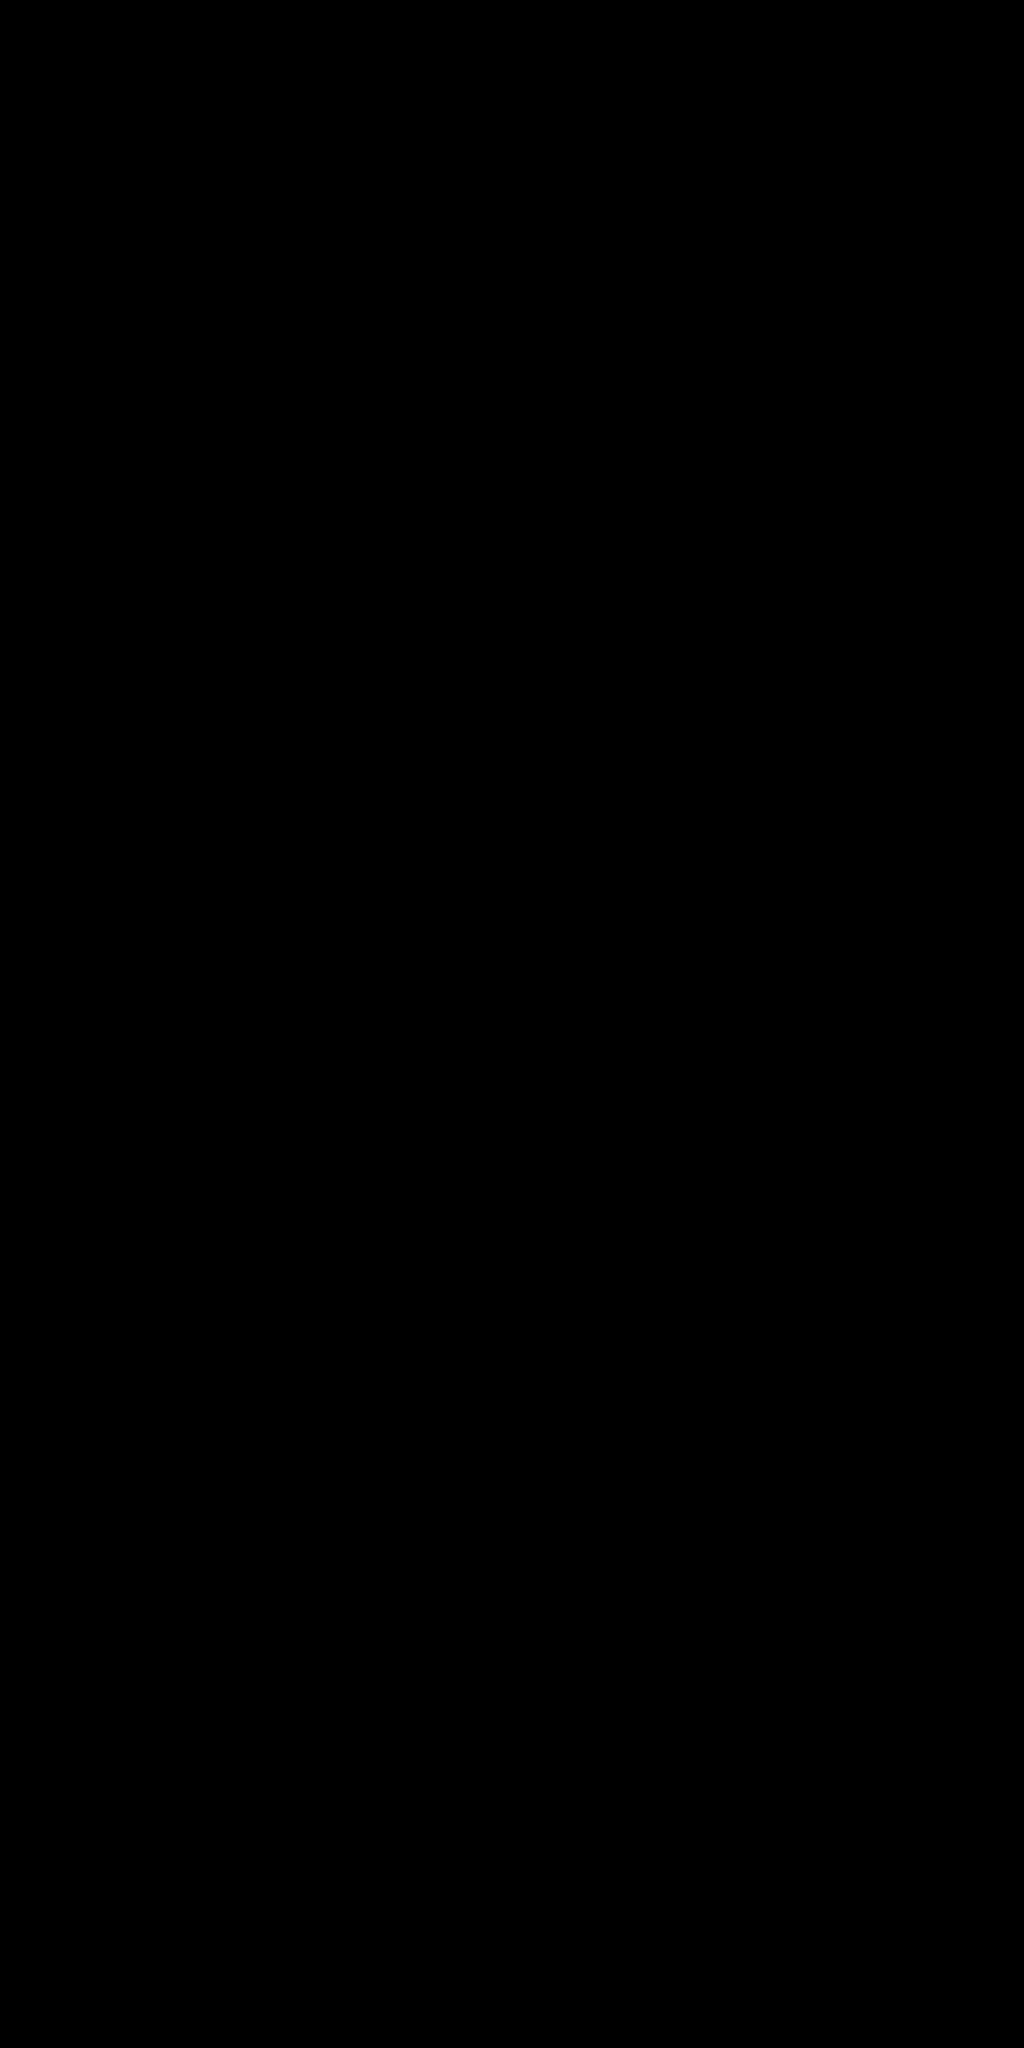 Screenshot from Gambit Weekly integration